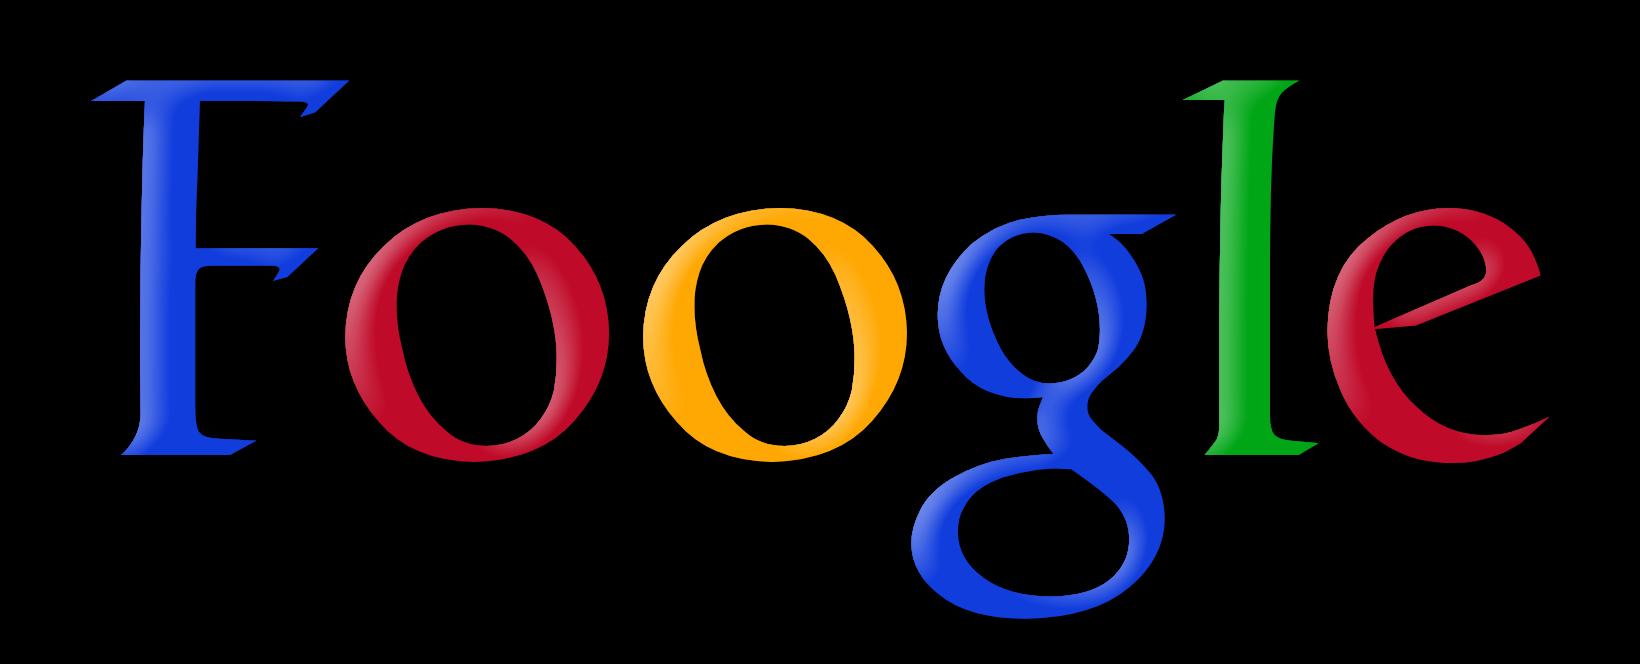 Foogle